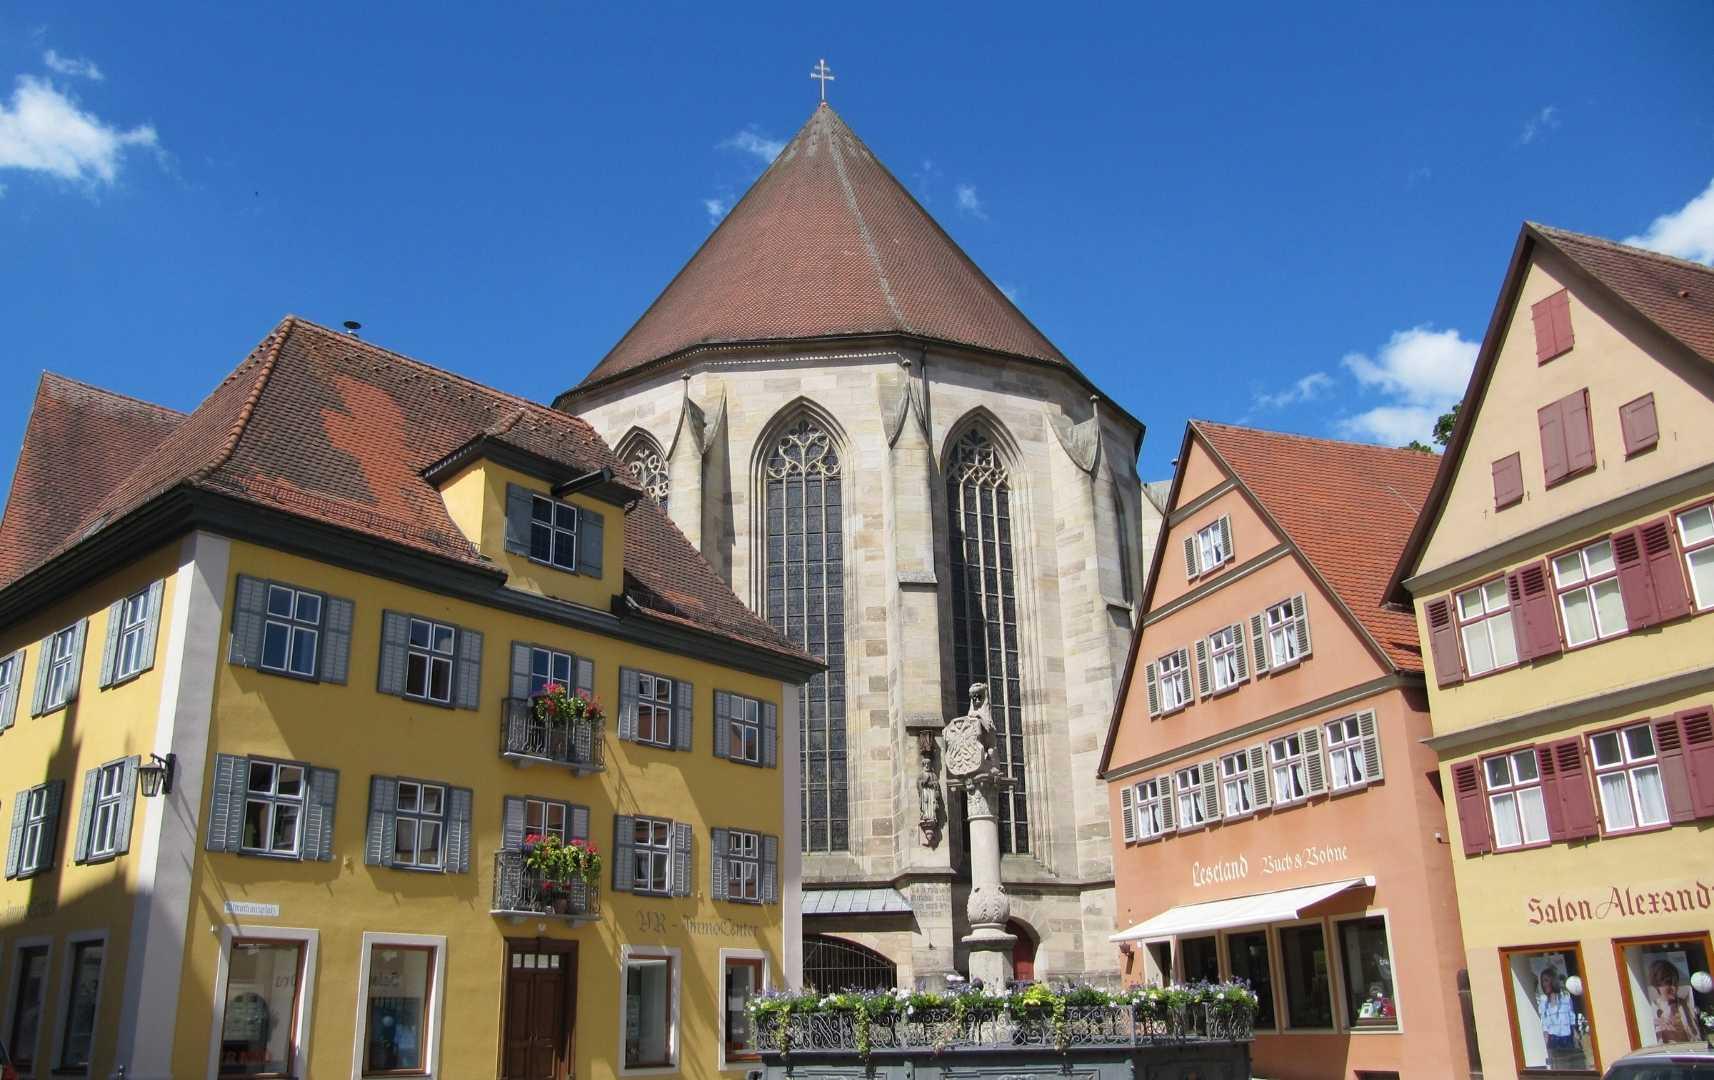 Dinkelsbühl - Urlaub in Bayern